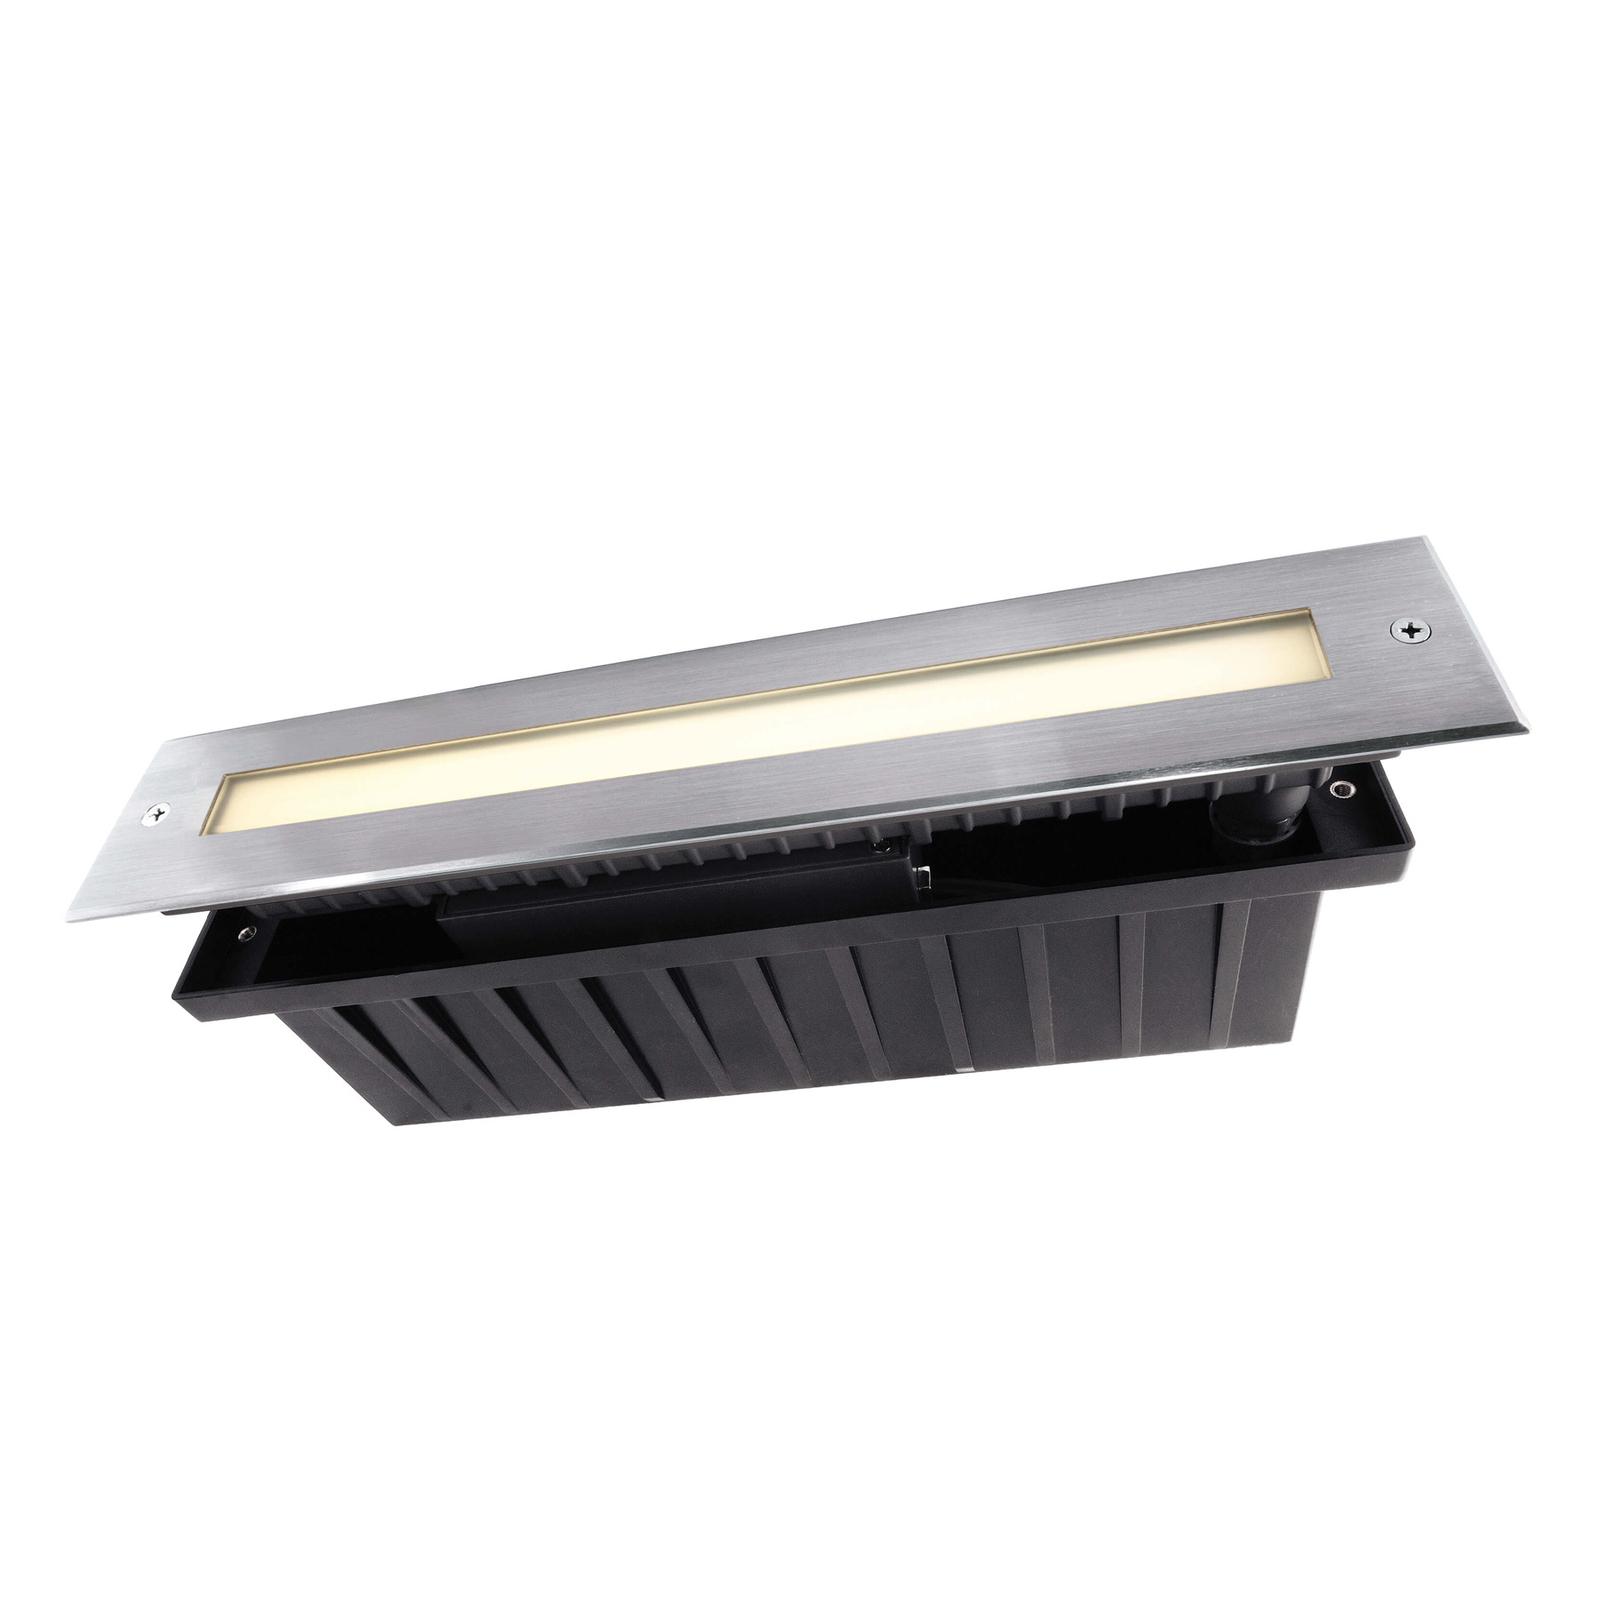 LED recessed floor light Line, 32.8 cm long_2501967_1